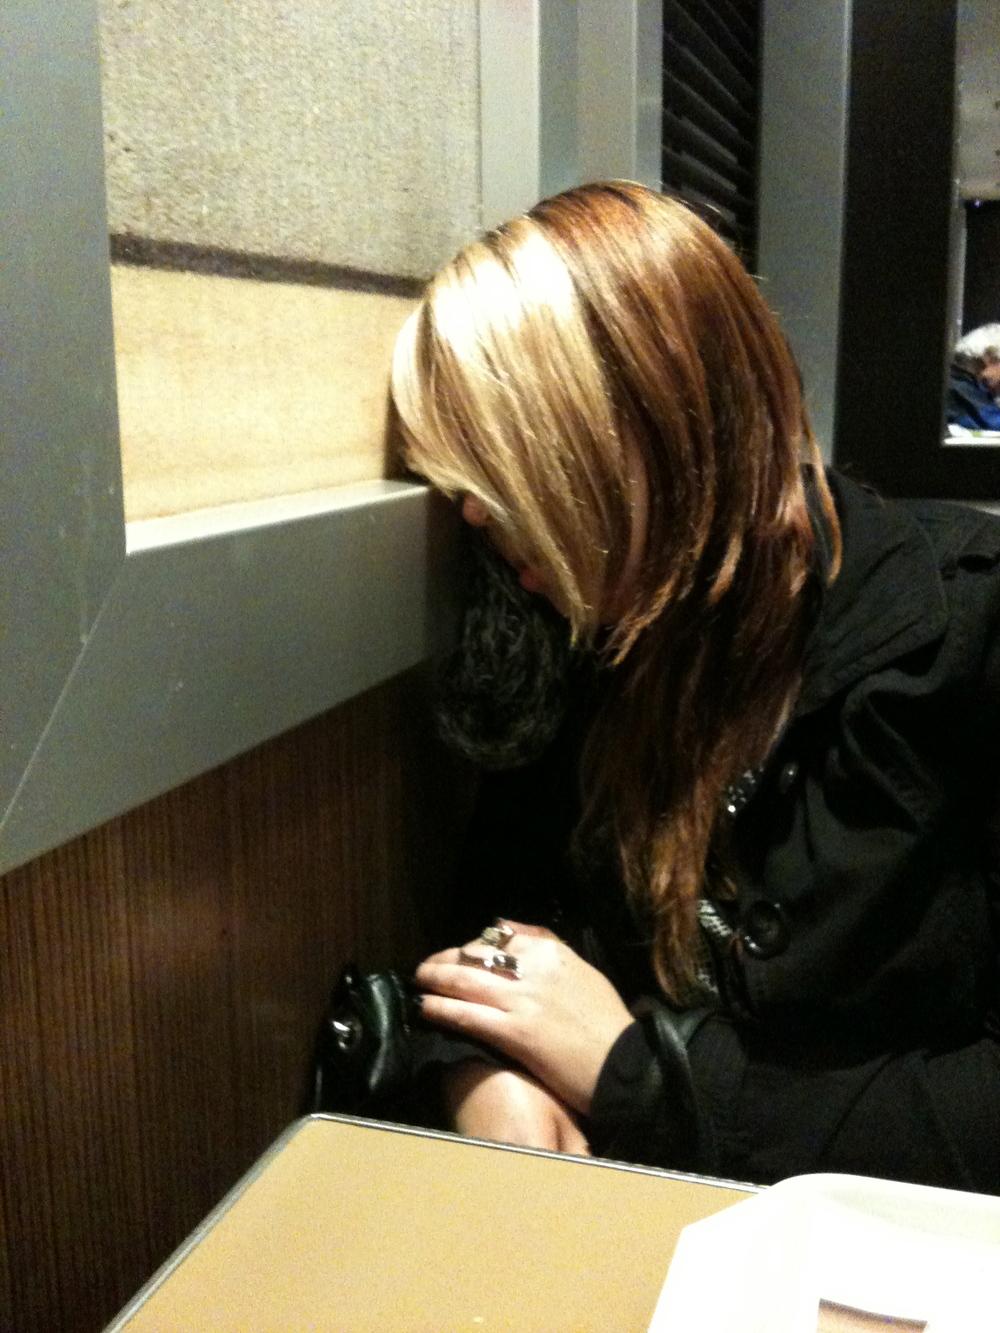 Rita sleeping in McDonalds